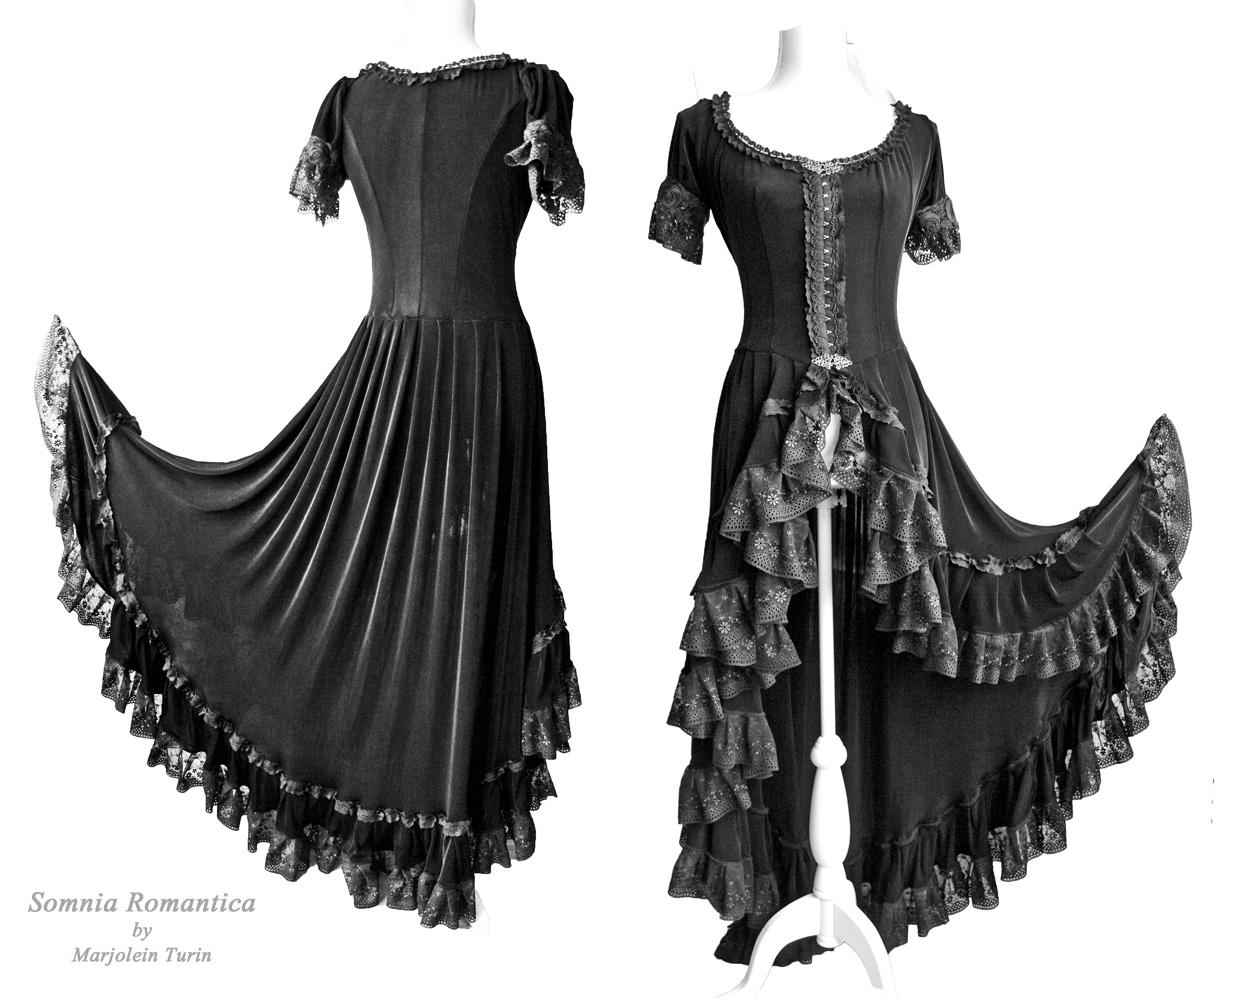 Dress Frances, Somnia Romantica by Marjolein Turin by SomniaRomantica